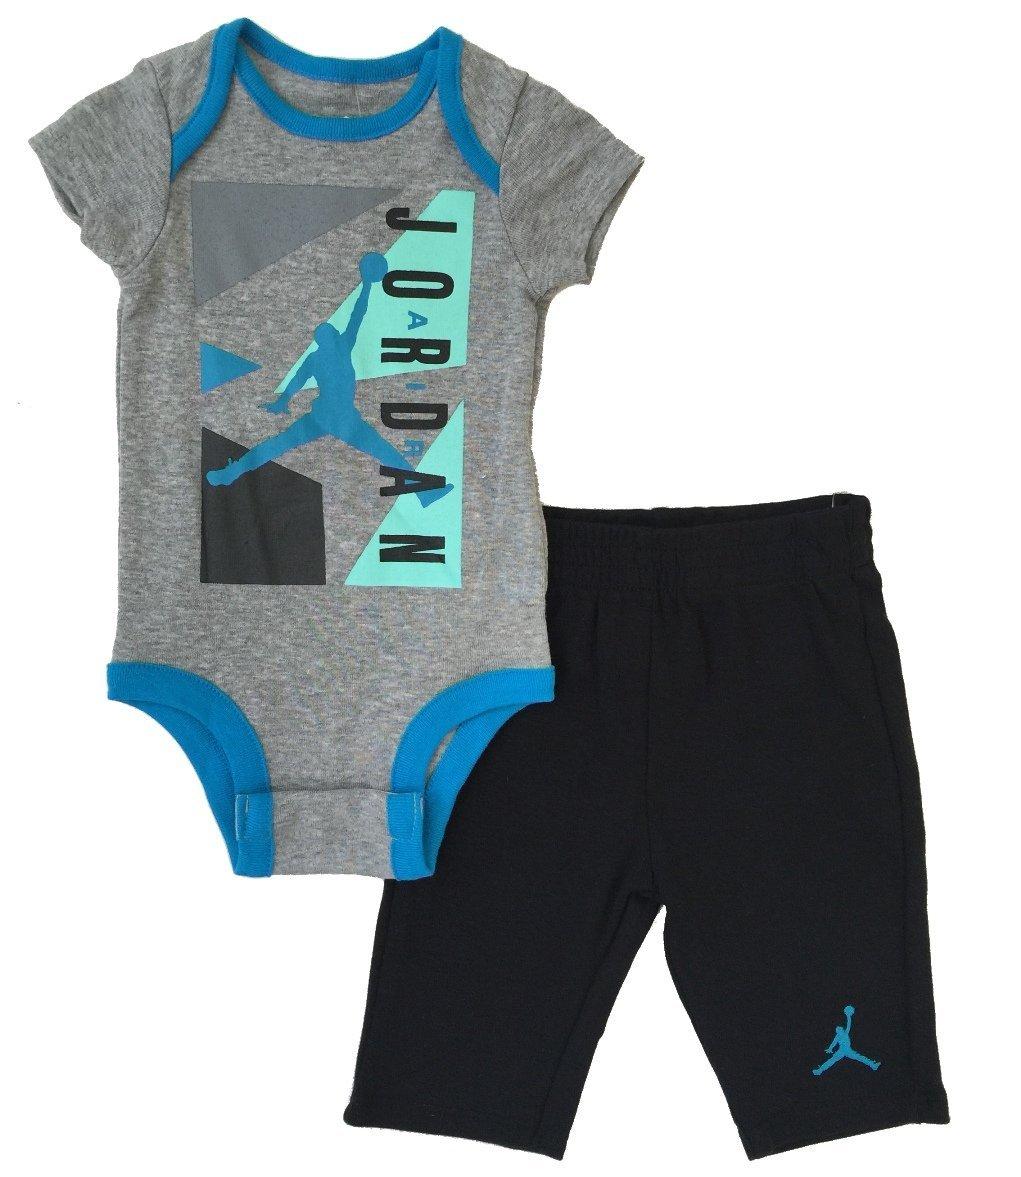 7135adb19348 Amazon.com: Nike Jordan Infants Bodysuit and Pants 2 Pcs Layette Set (6/9M):  Sports & Outdoors